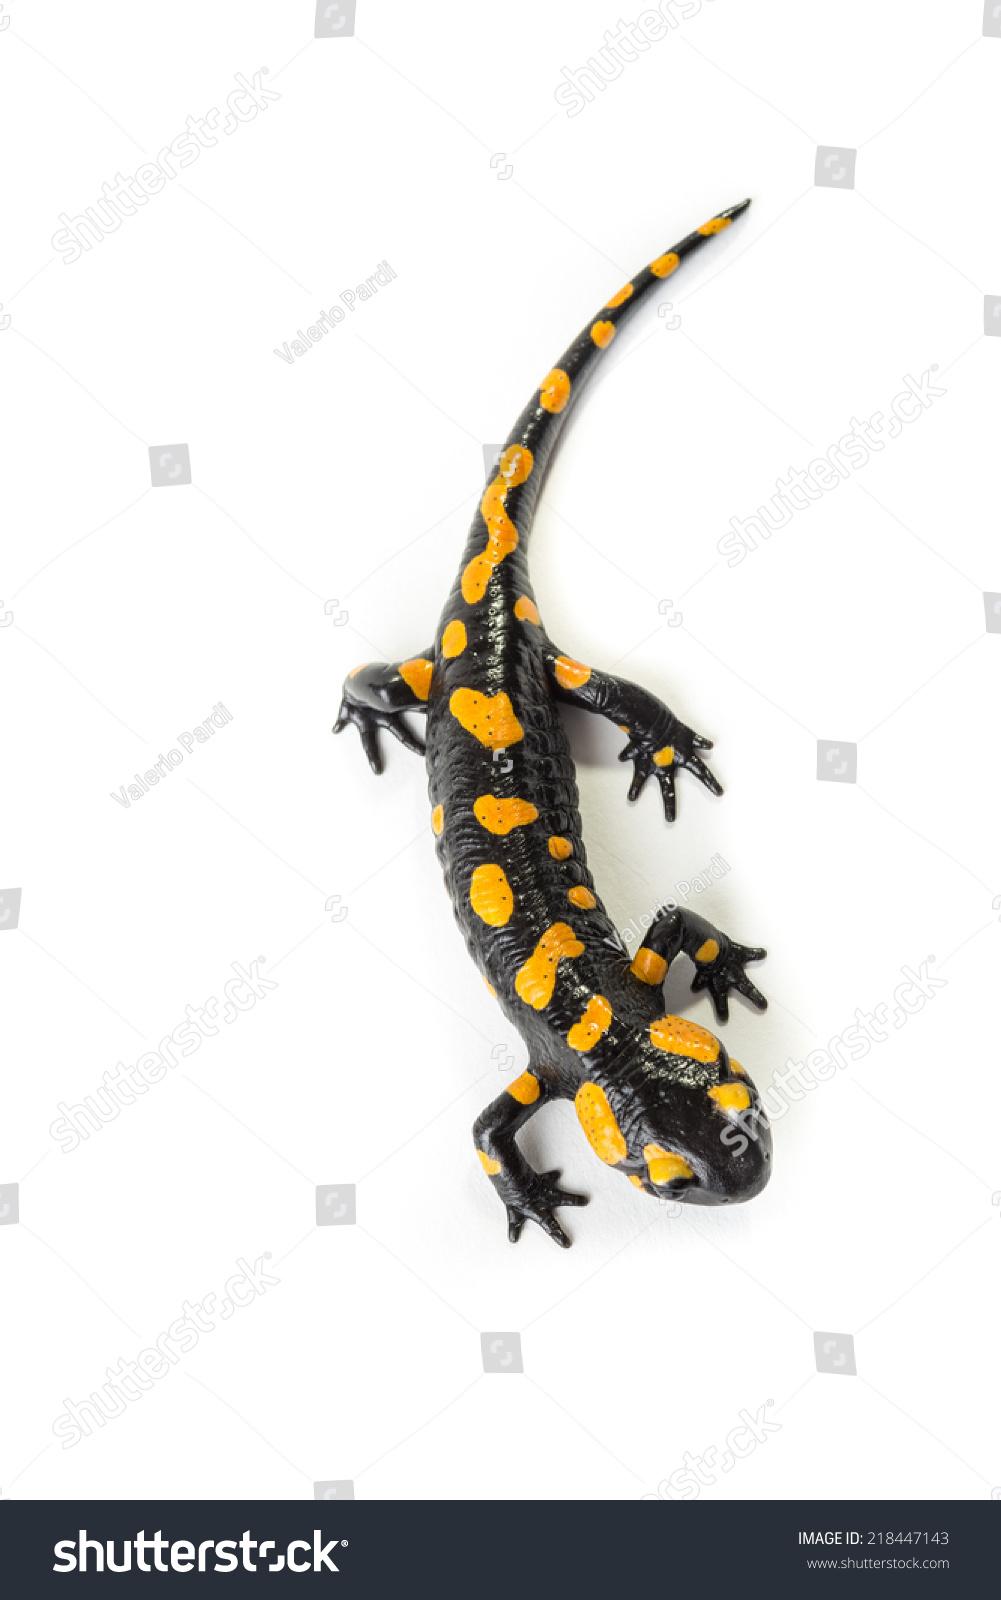 salamander white background -#main